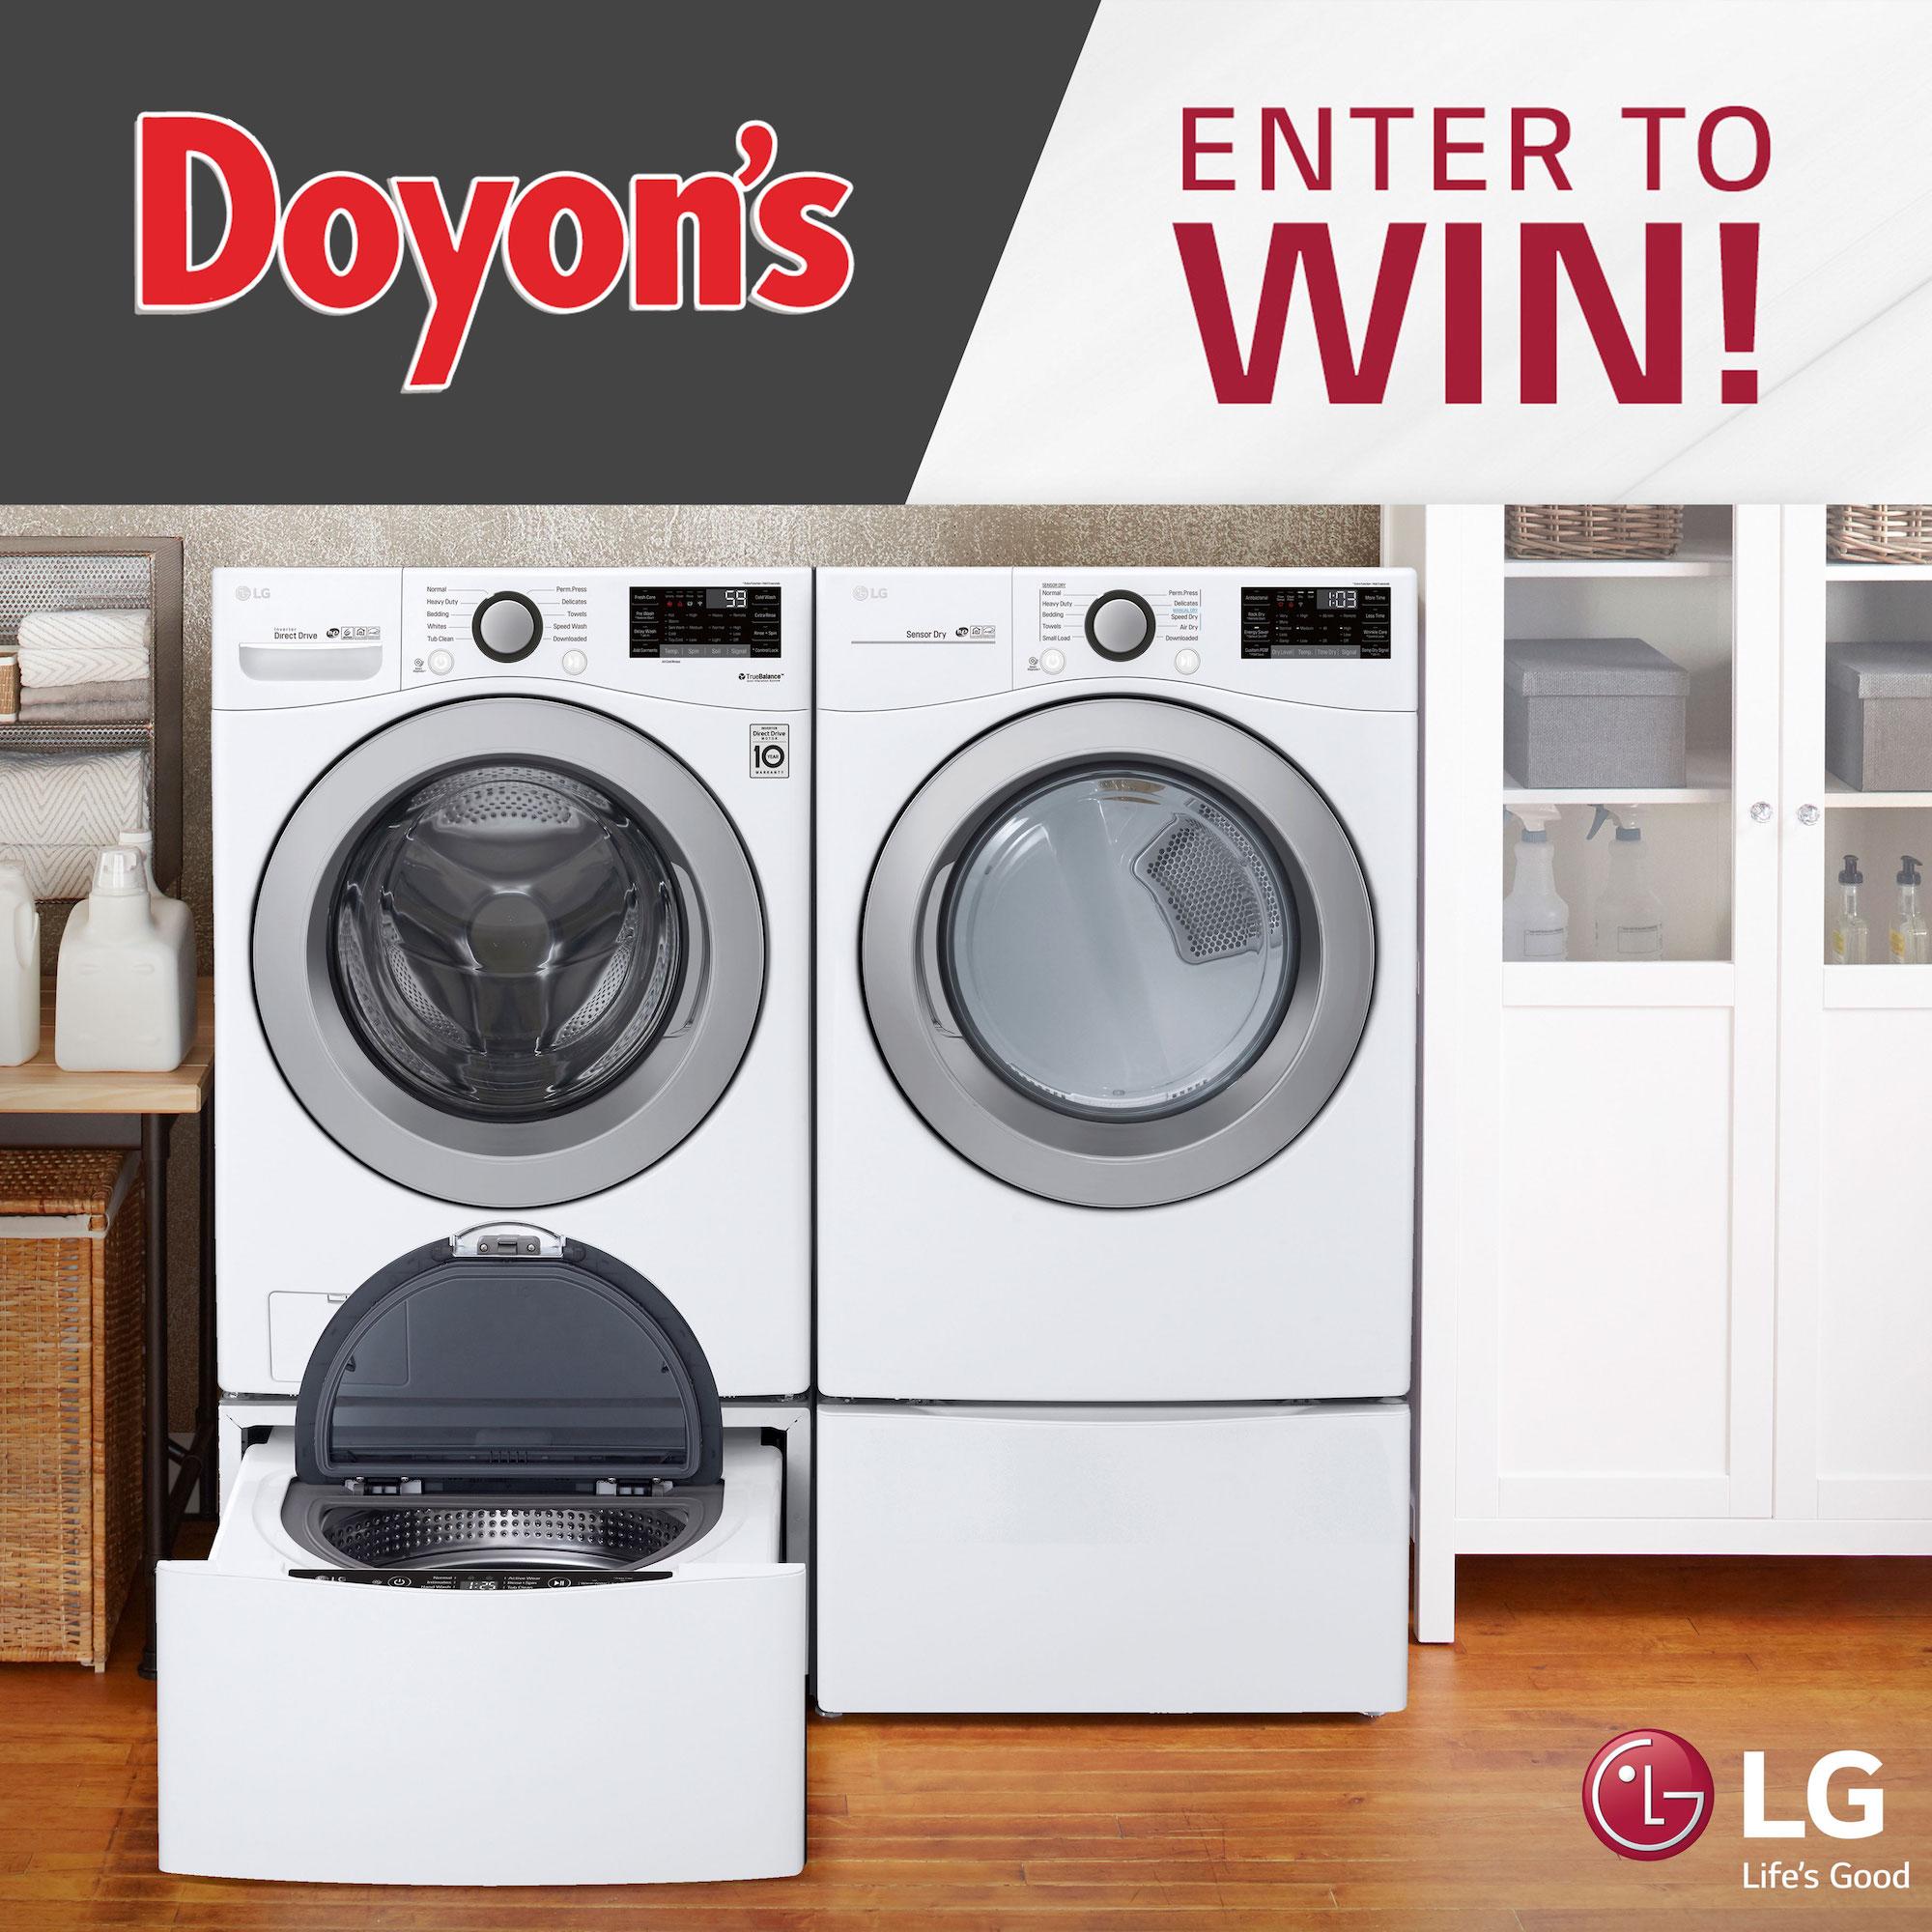 doyons-appliance.jpg